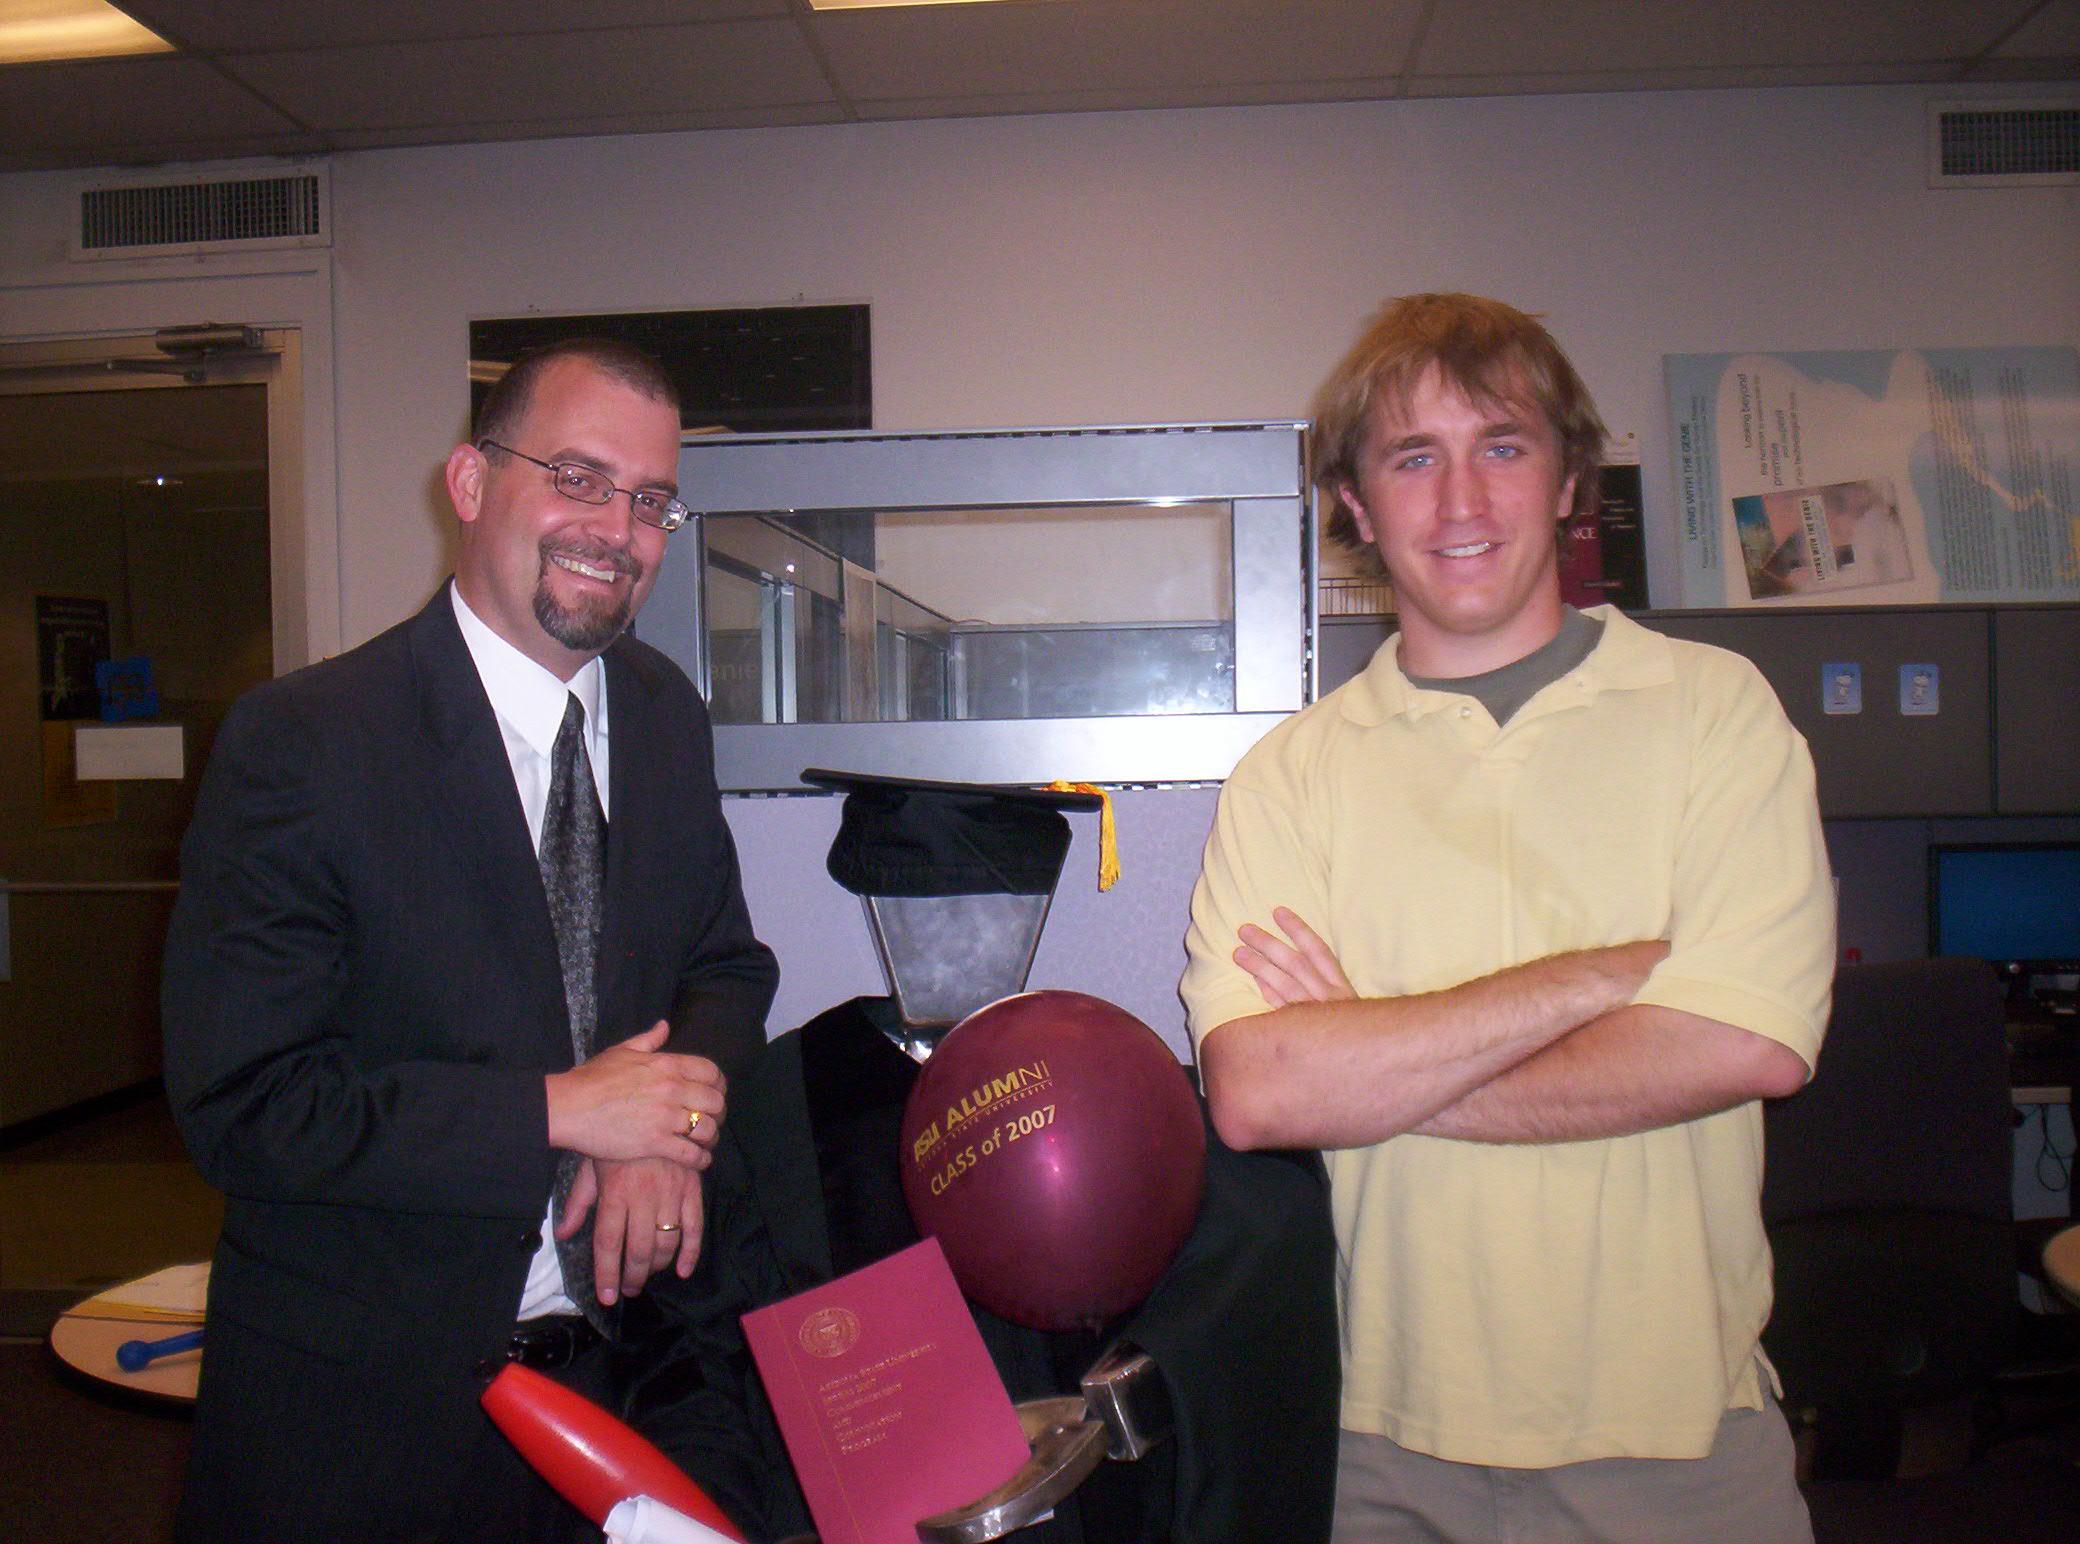 Zachary Pirtle and Professor Clark Miller